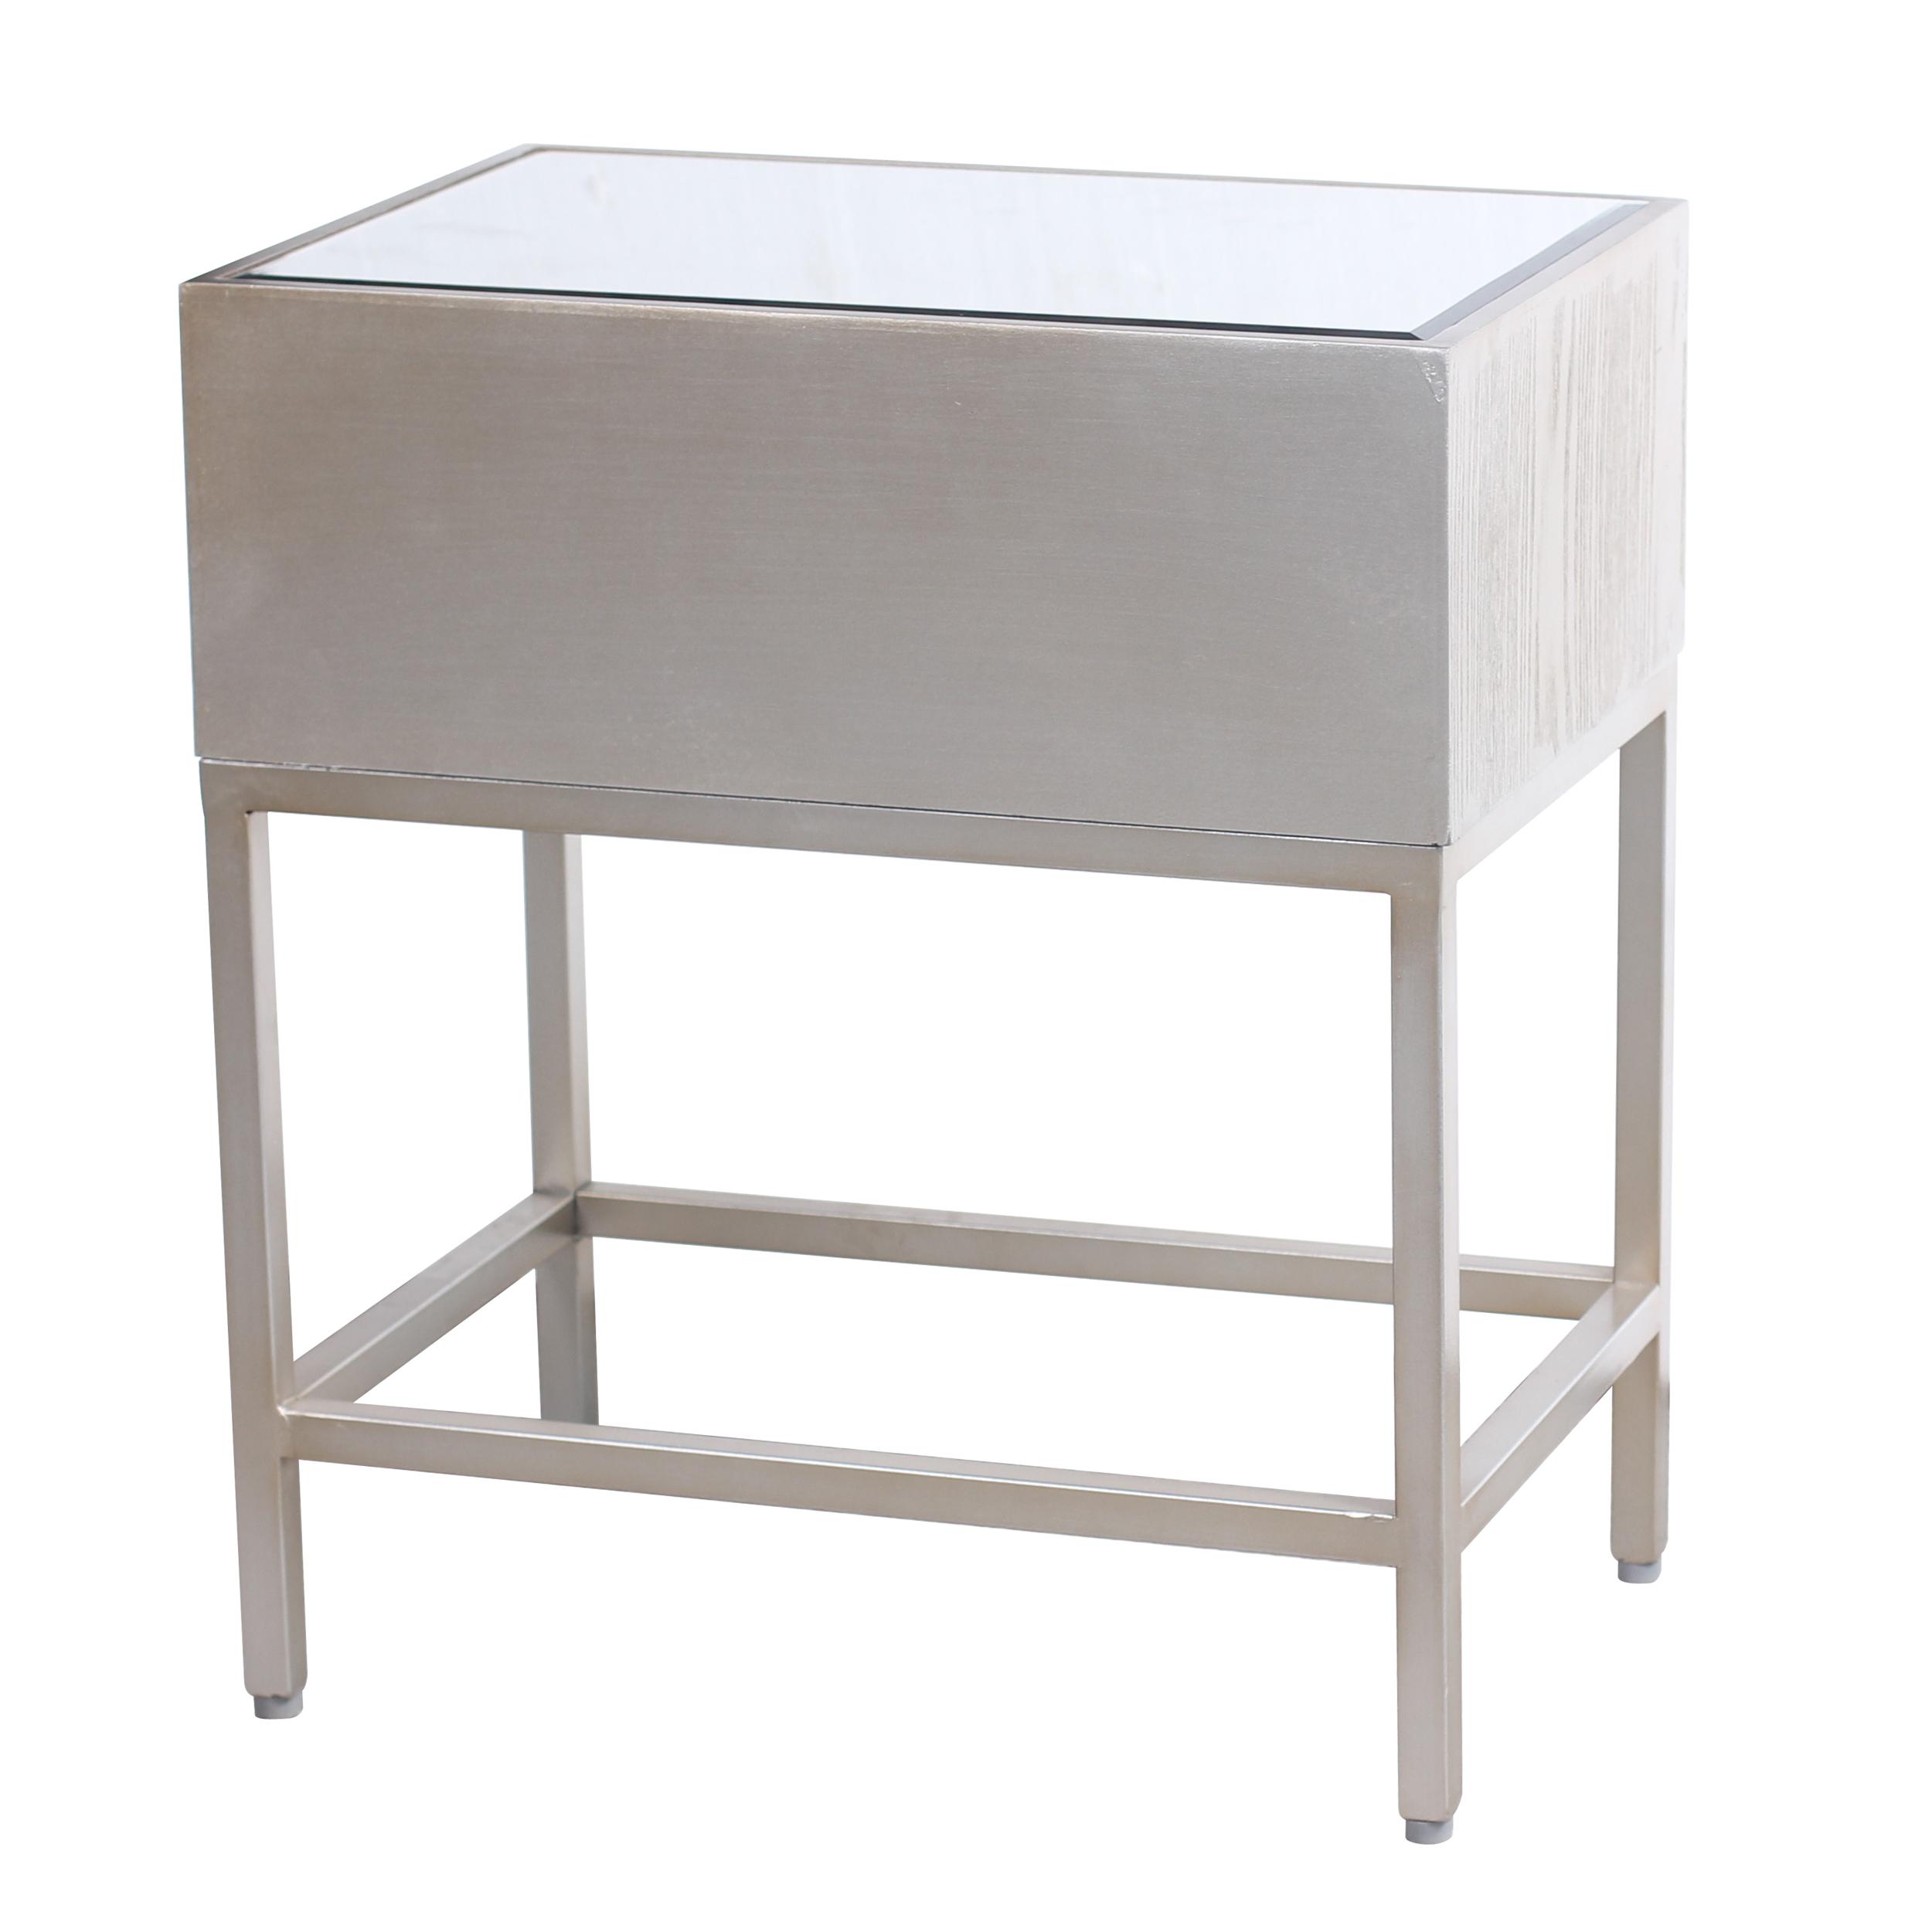 1500001 Npd Home Furniture Wholesale Lifestyle